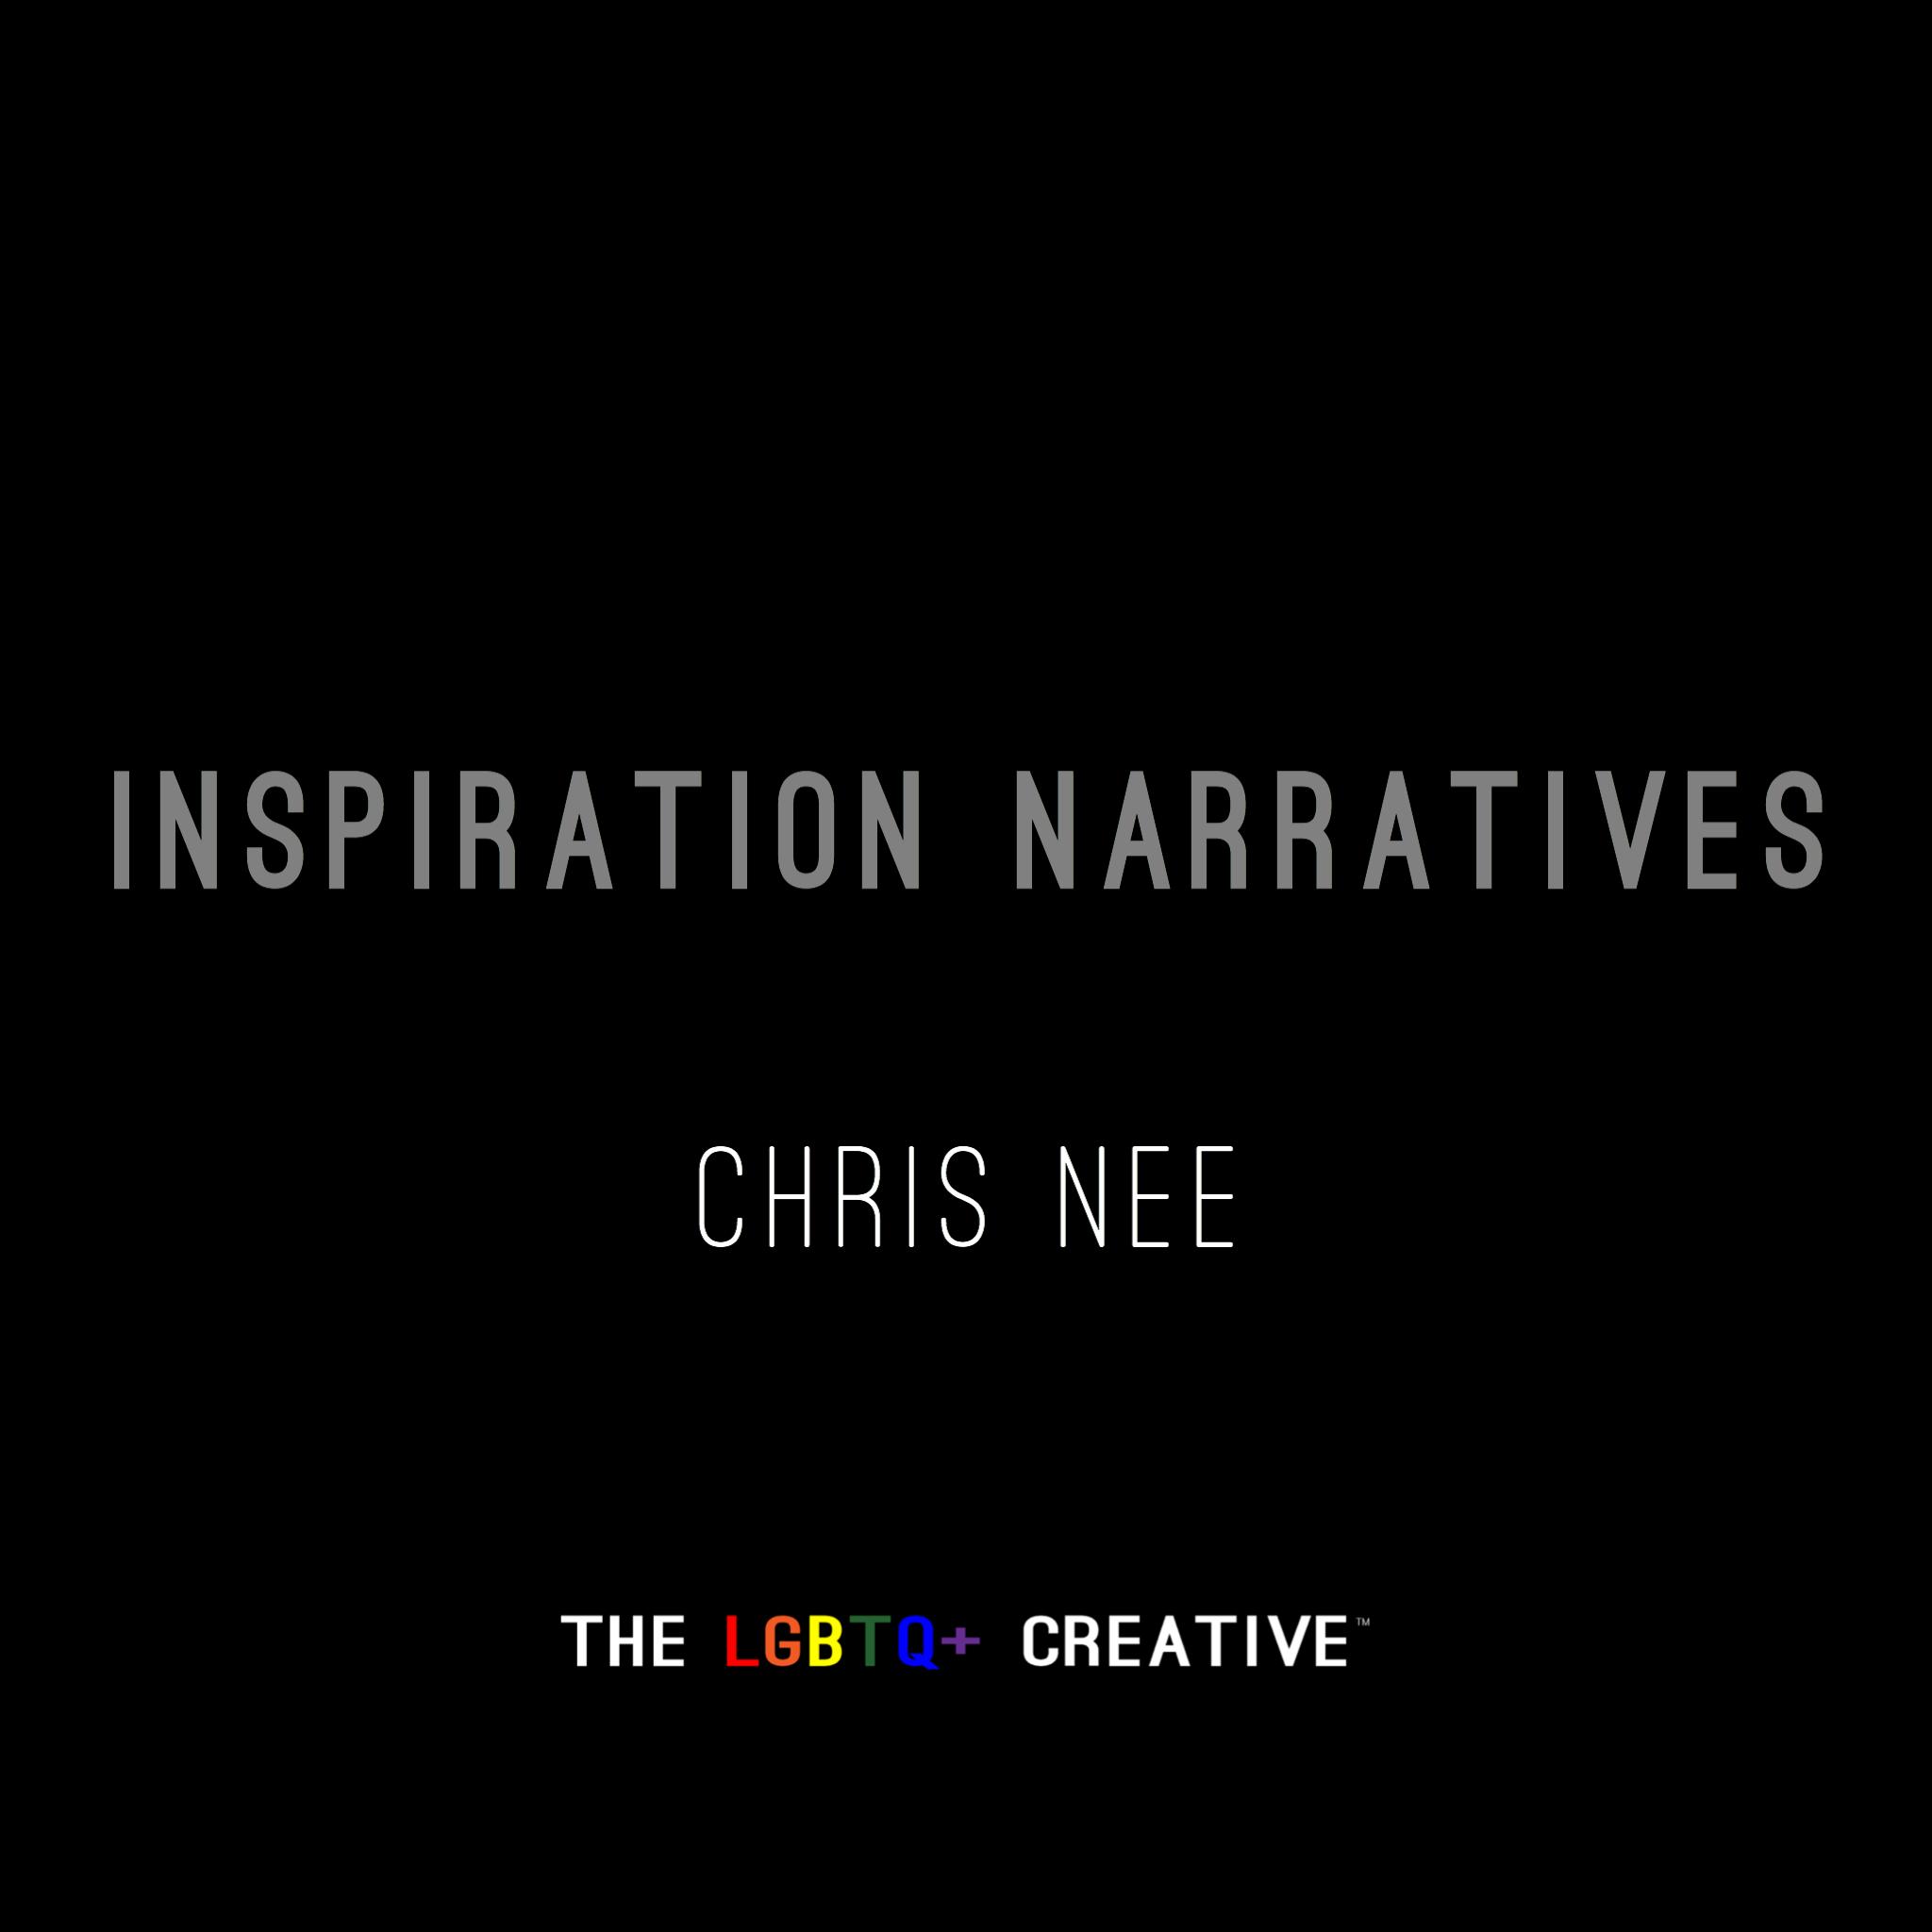 Copy of Inspiration Narratives - Chris Nee